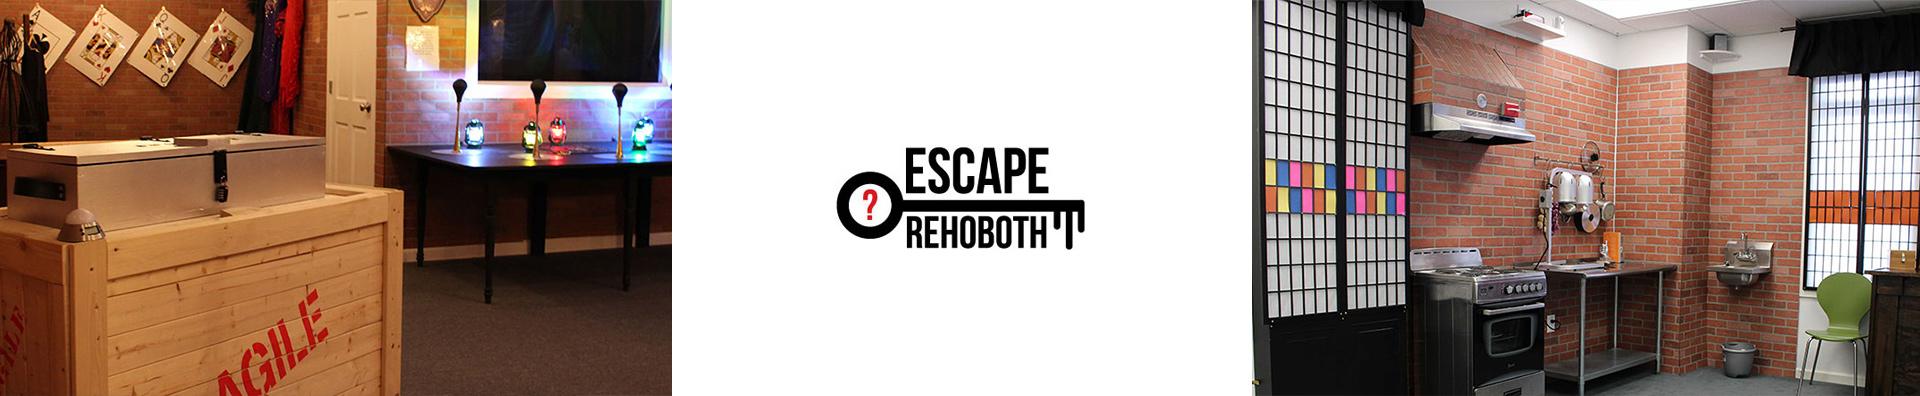 Escape Rehoboth